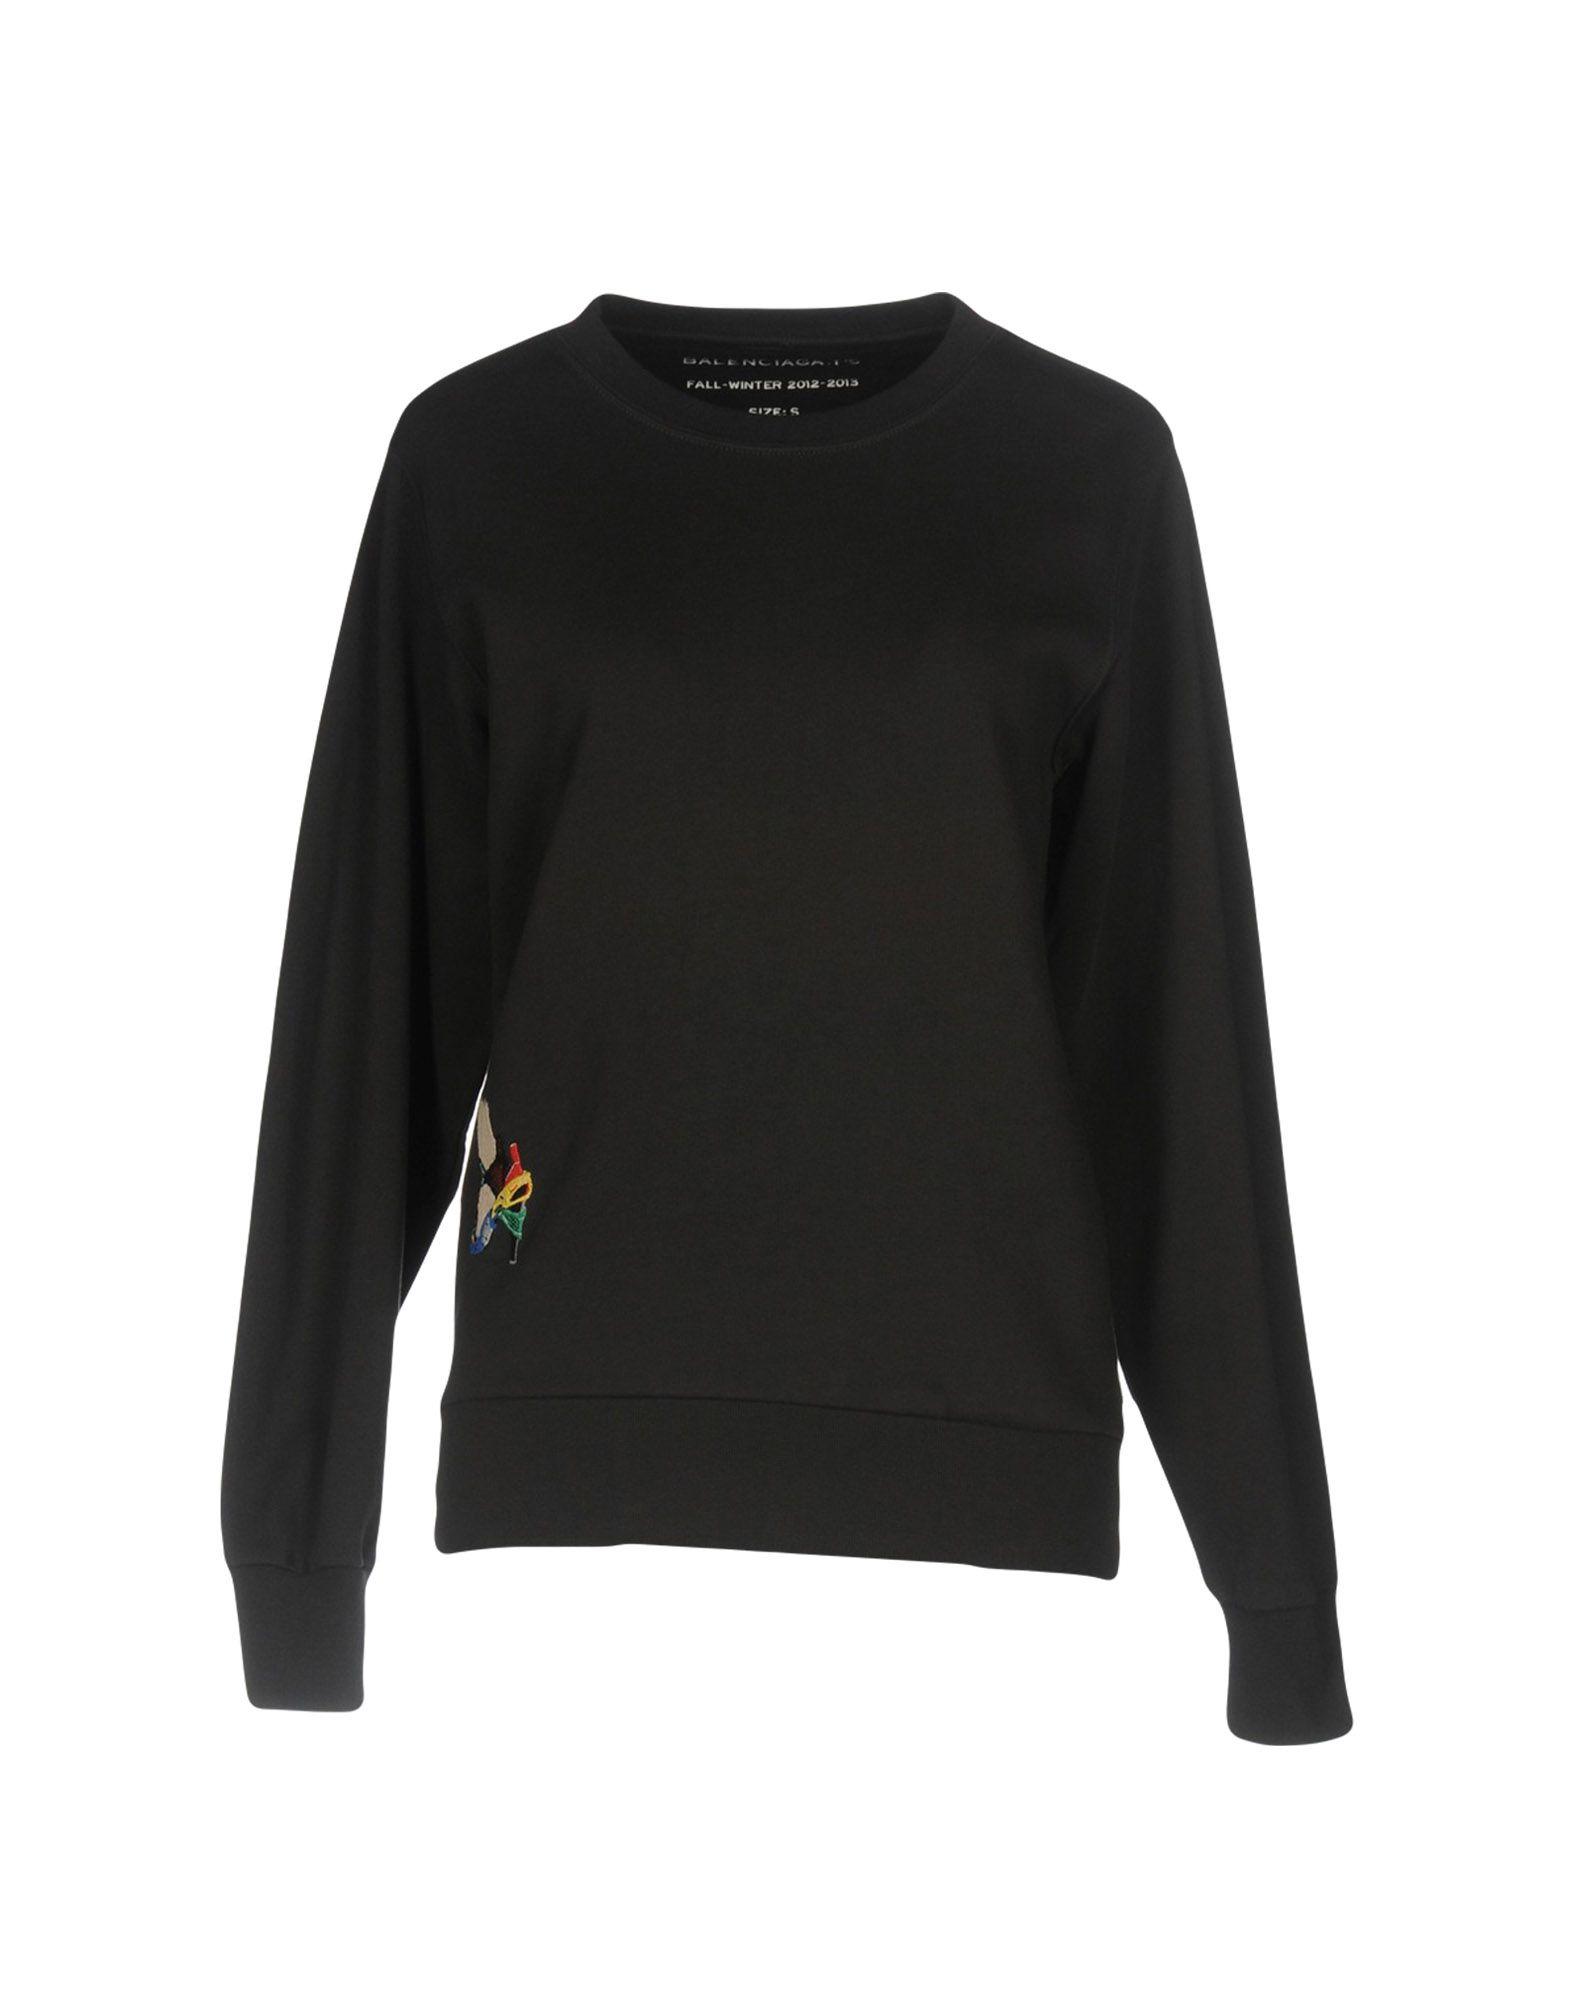 Balenciaga Sweatshirts Shop At Ebates